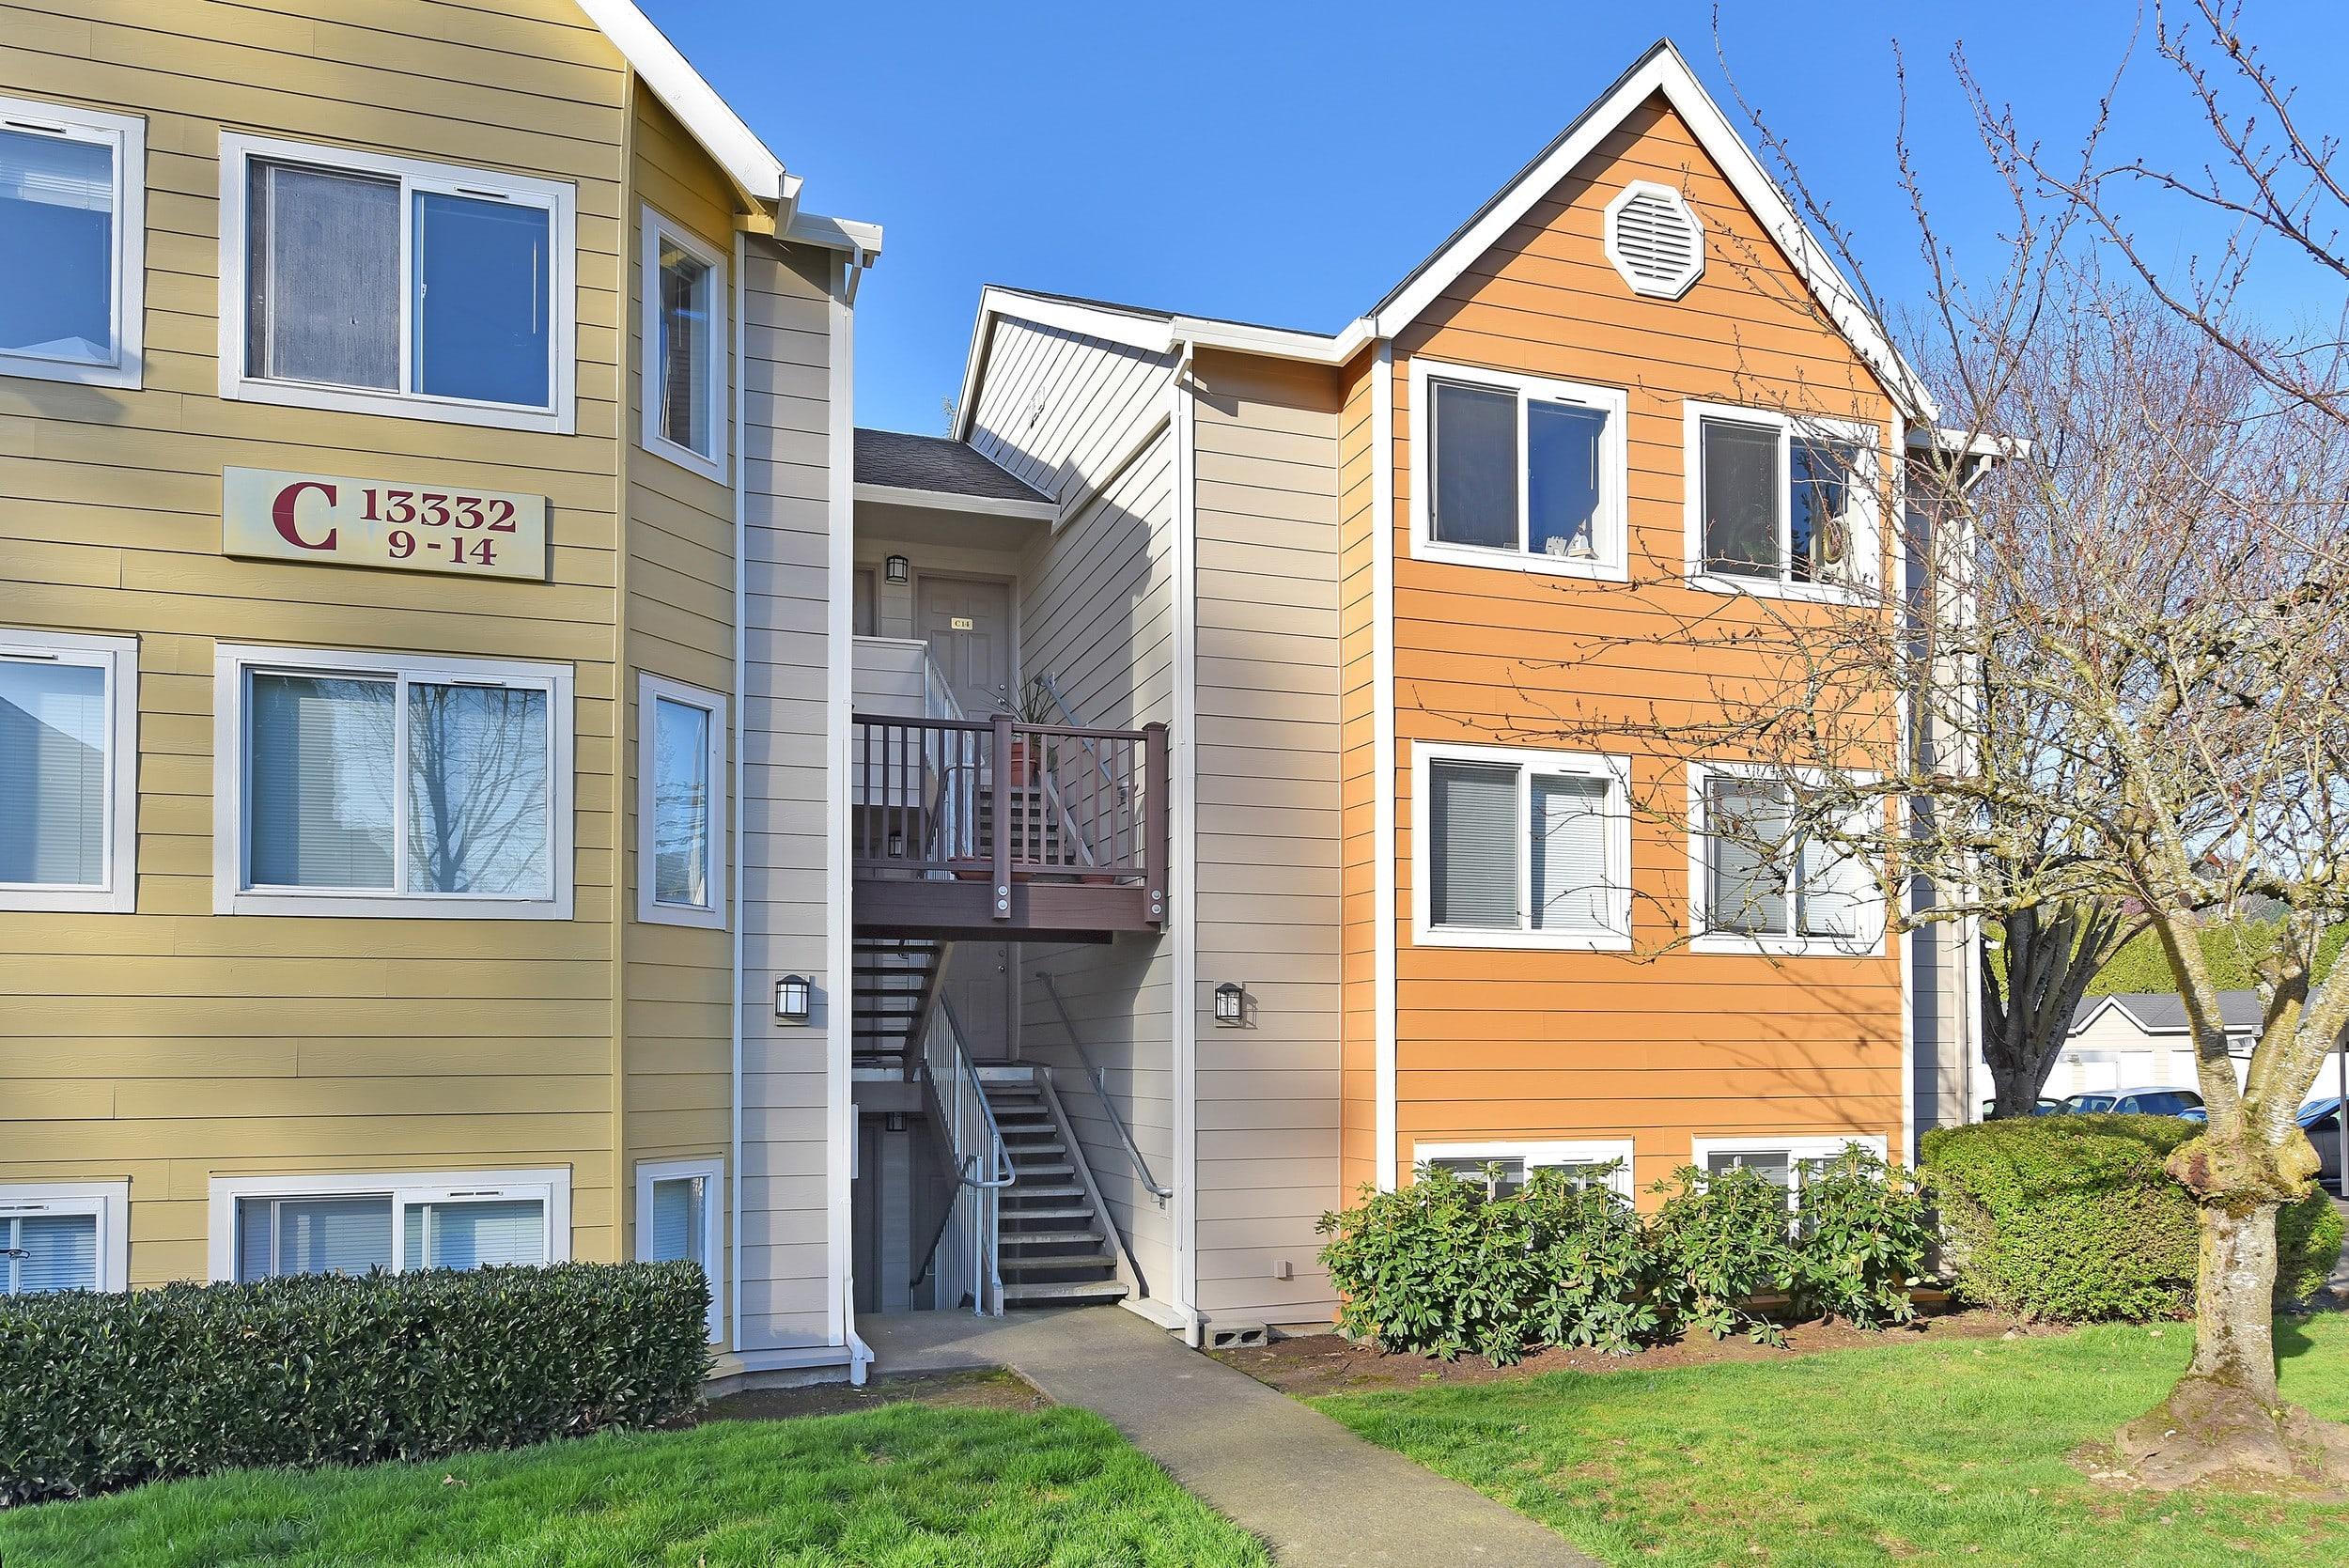 Exterior View Apartments At Preserve at Sunnyside Apartments In Clackamas OR